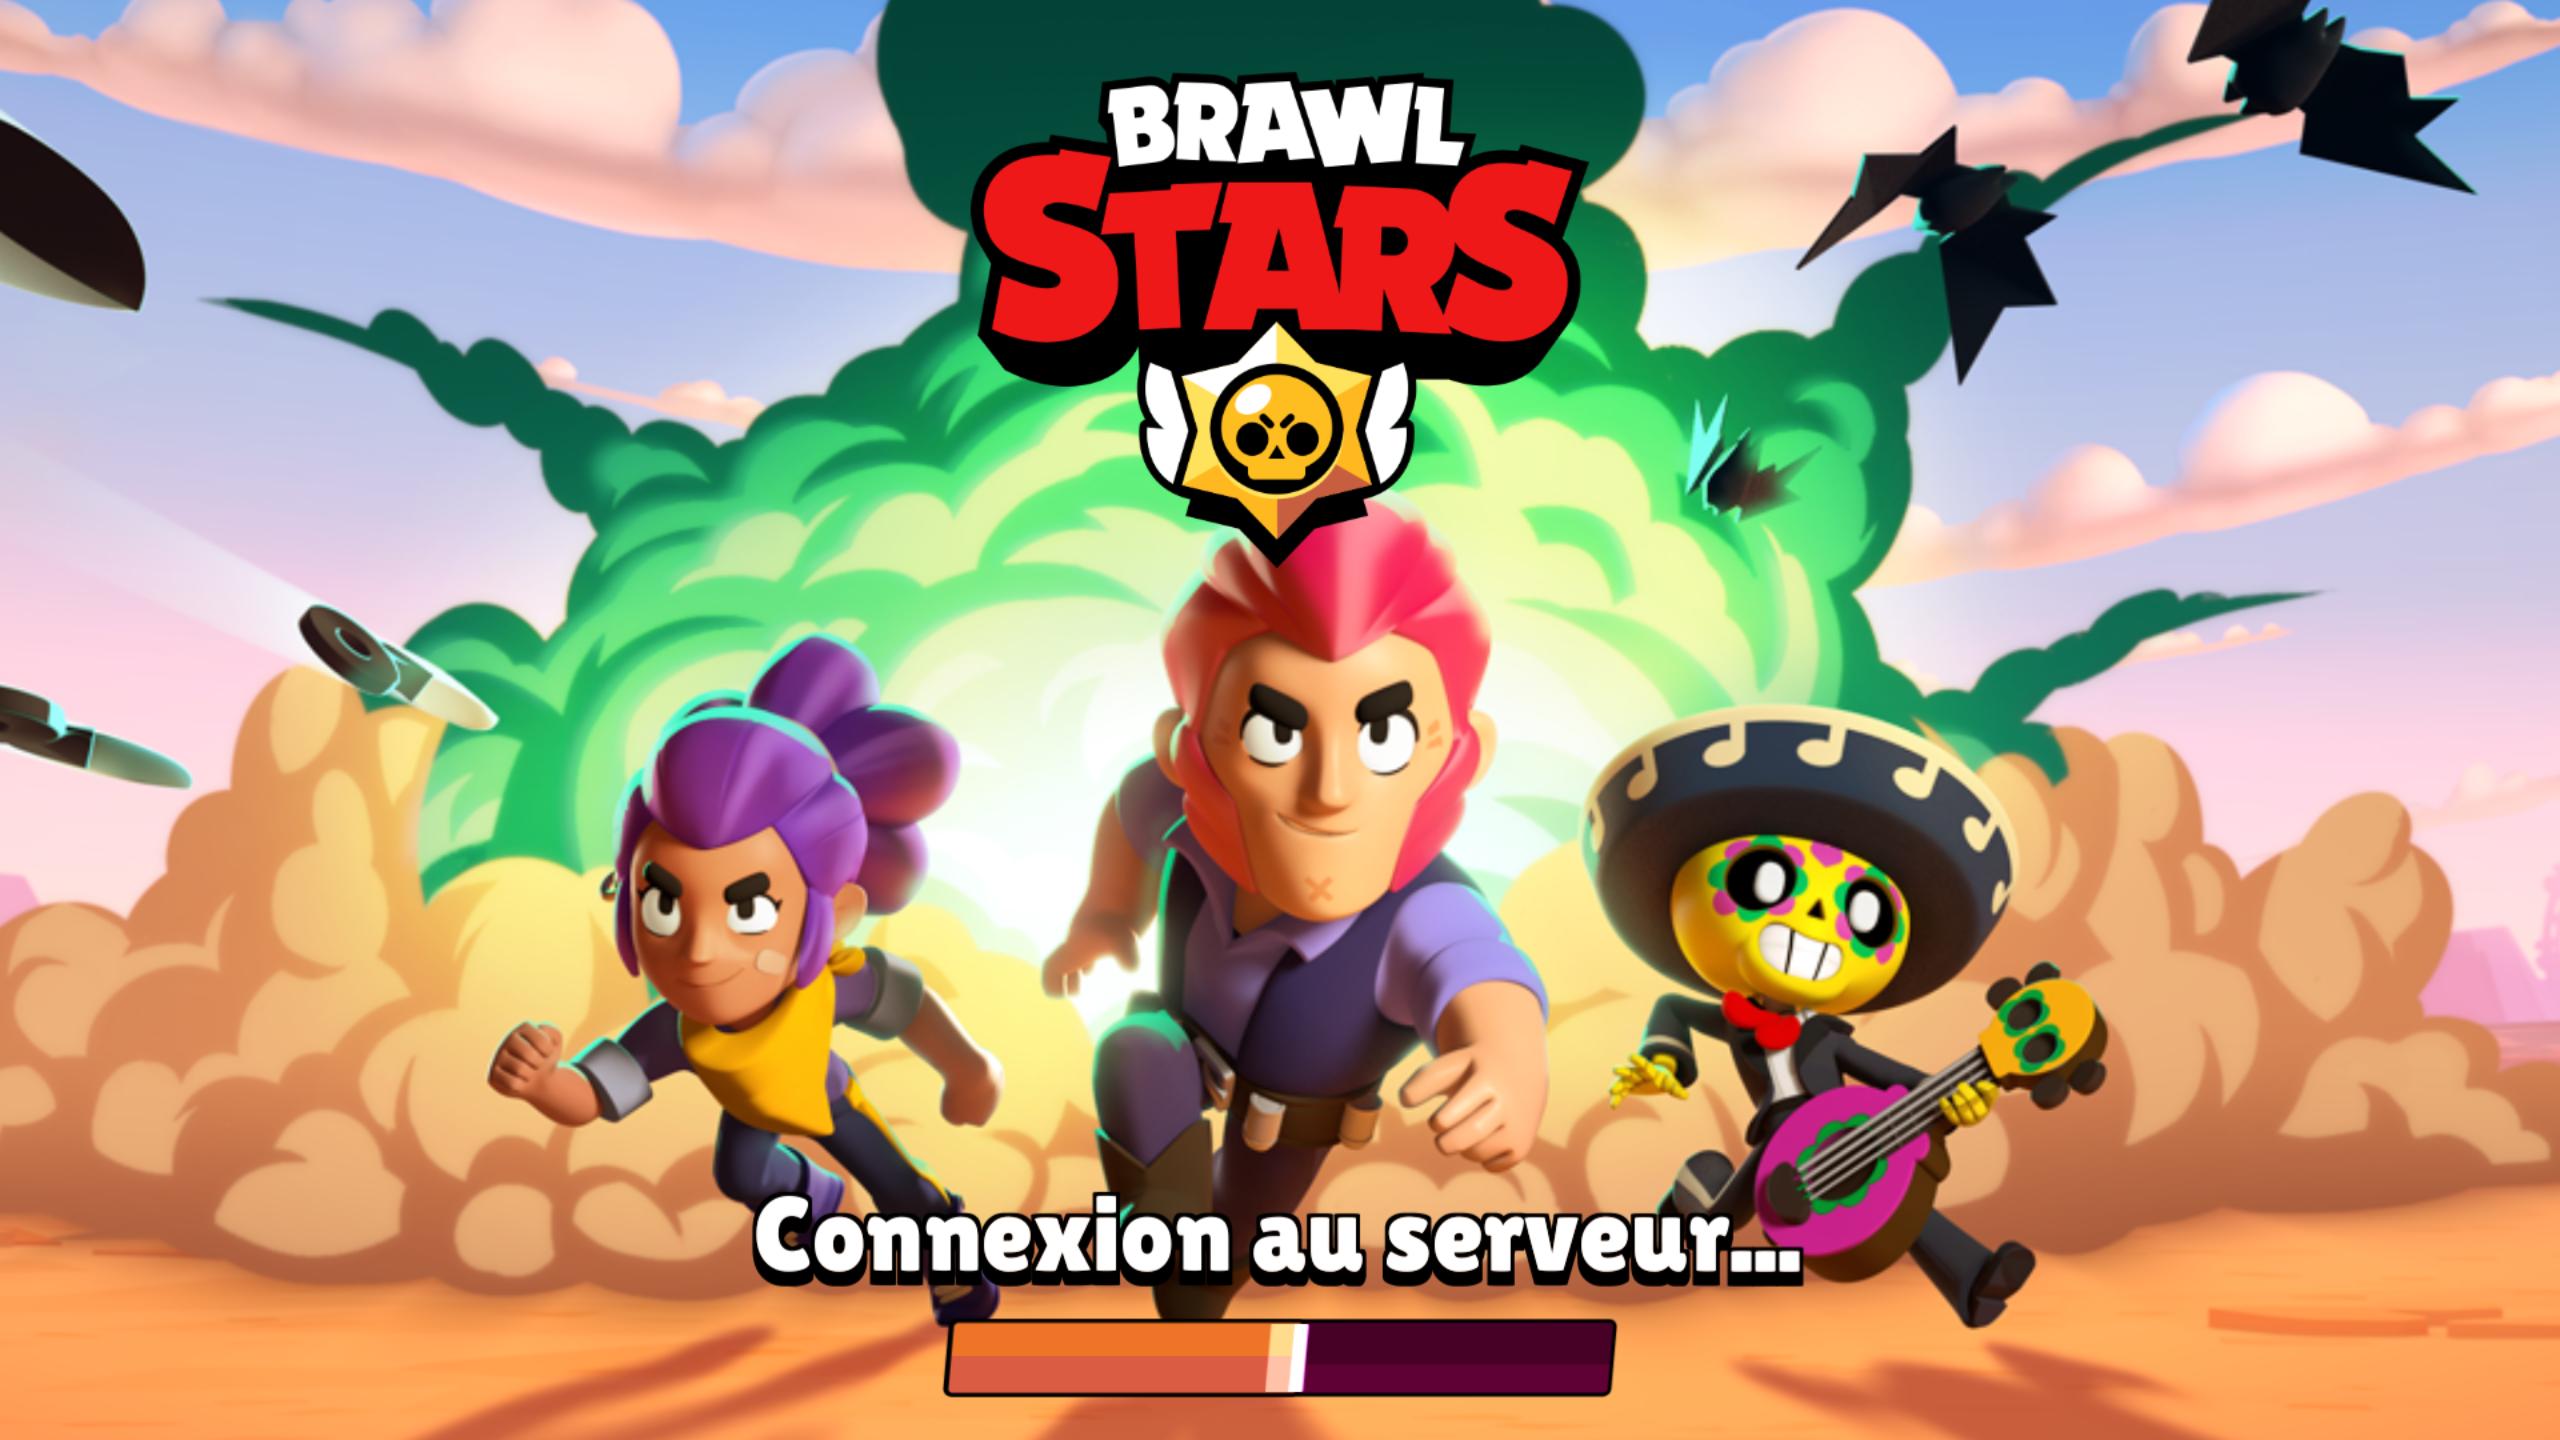 Brawl Stars Android 19 20 Test Photos Video